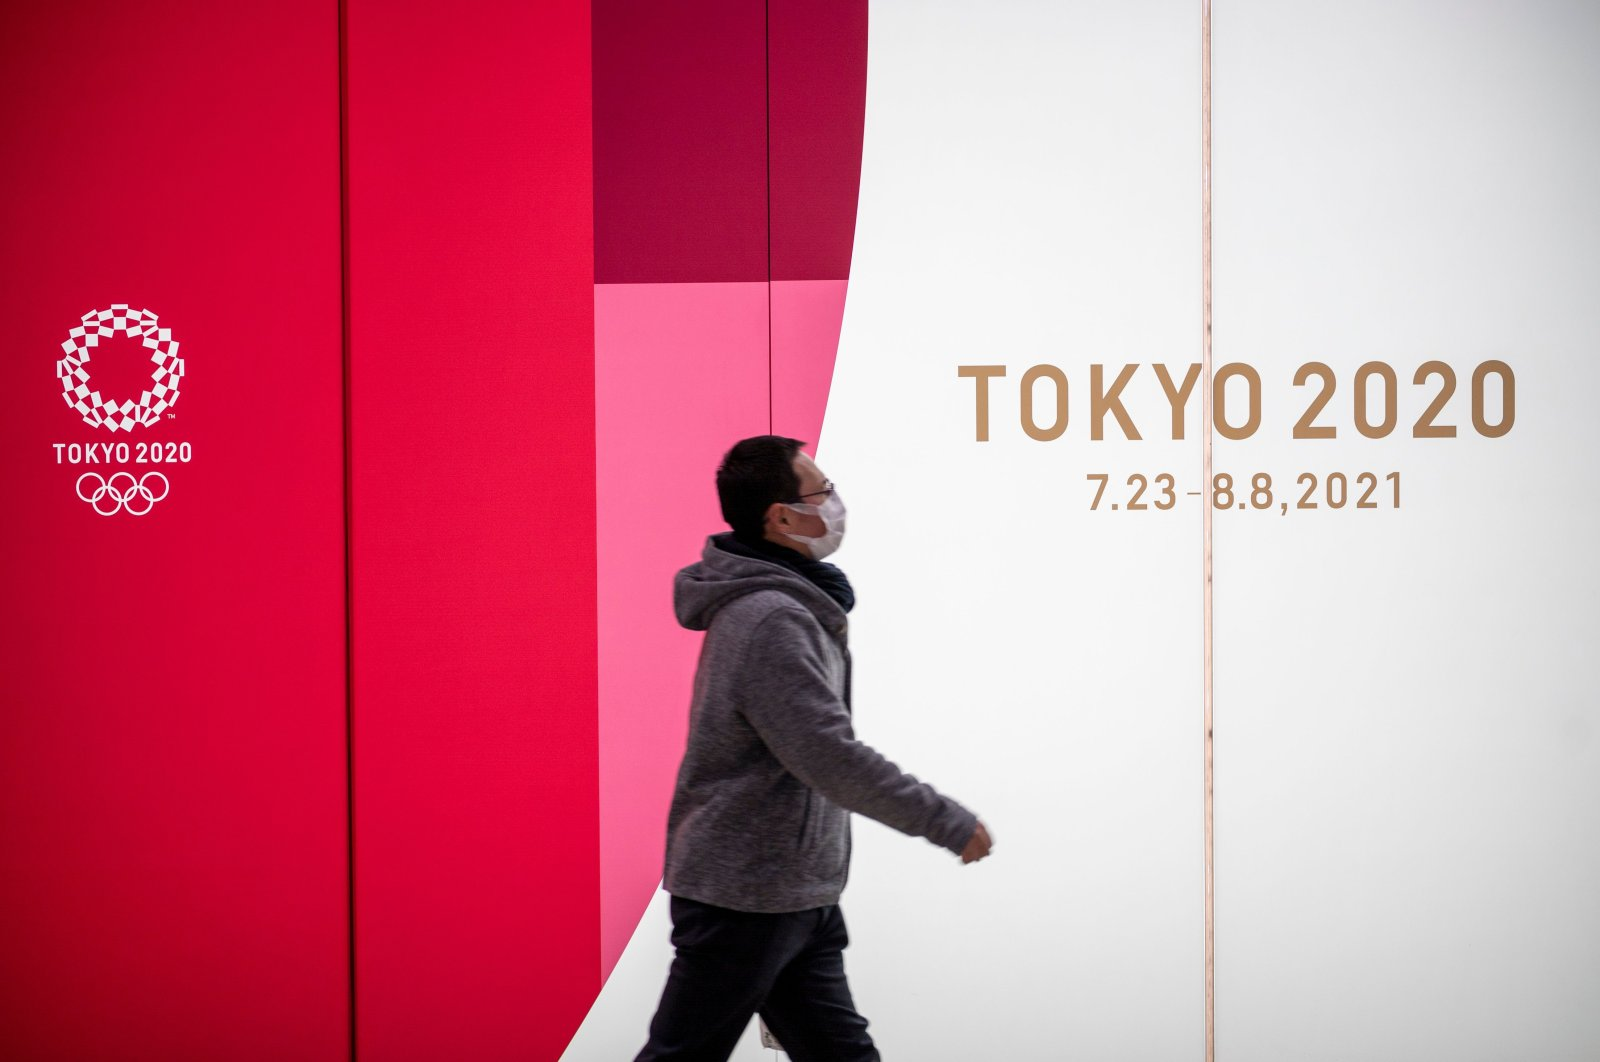 A man walks past Tokyo 2020 Olympic and Paralympic Games advertising in Tokyo's Shinjuku district, Japan, Jan. 20, 2021. (AFP Photo)